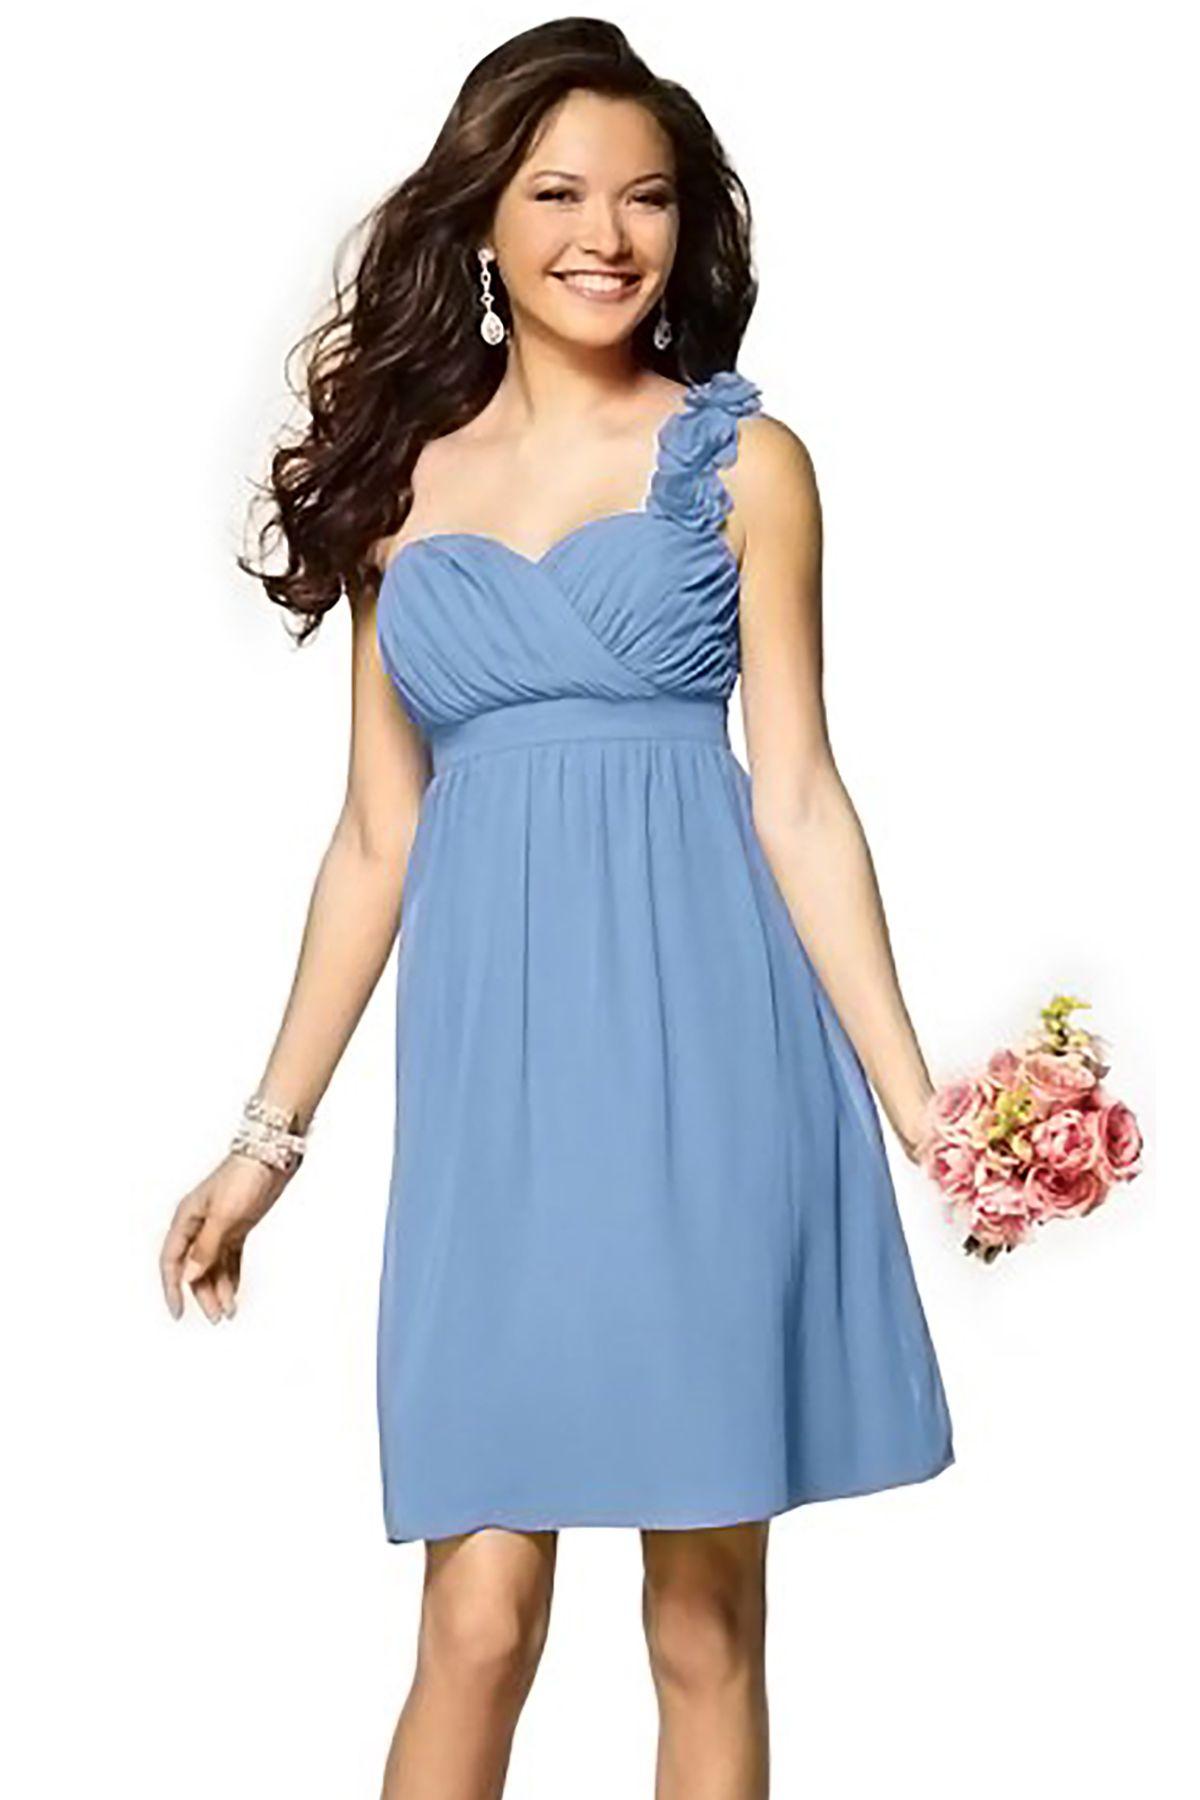 Light blue dress for wedding  Alfred Angelo  Bridesmaid Dress in Light blue in Chiffon  Dream